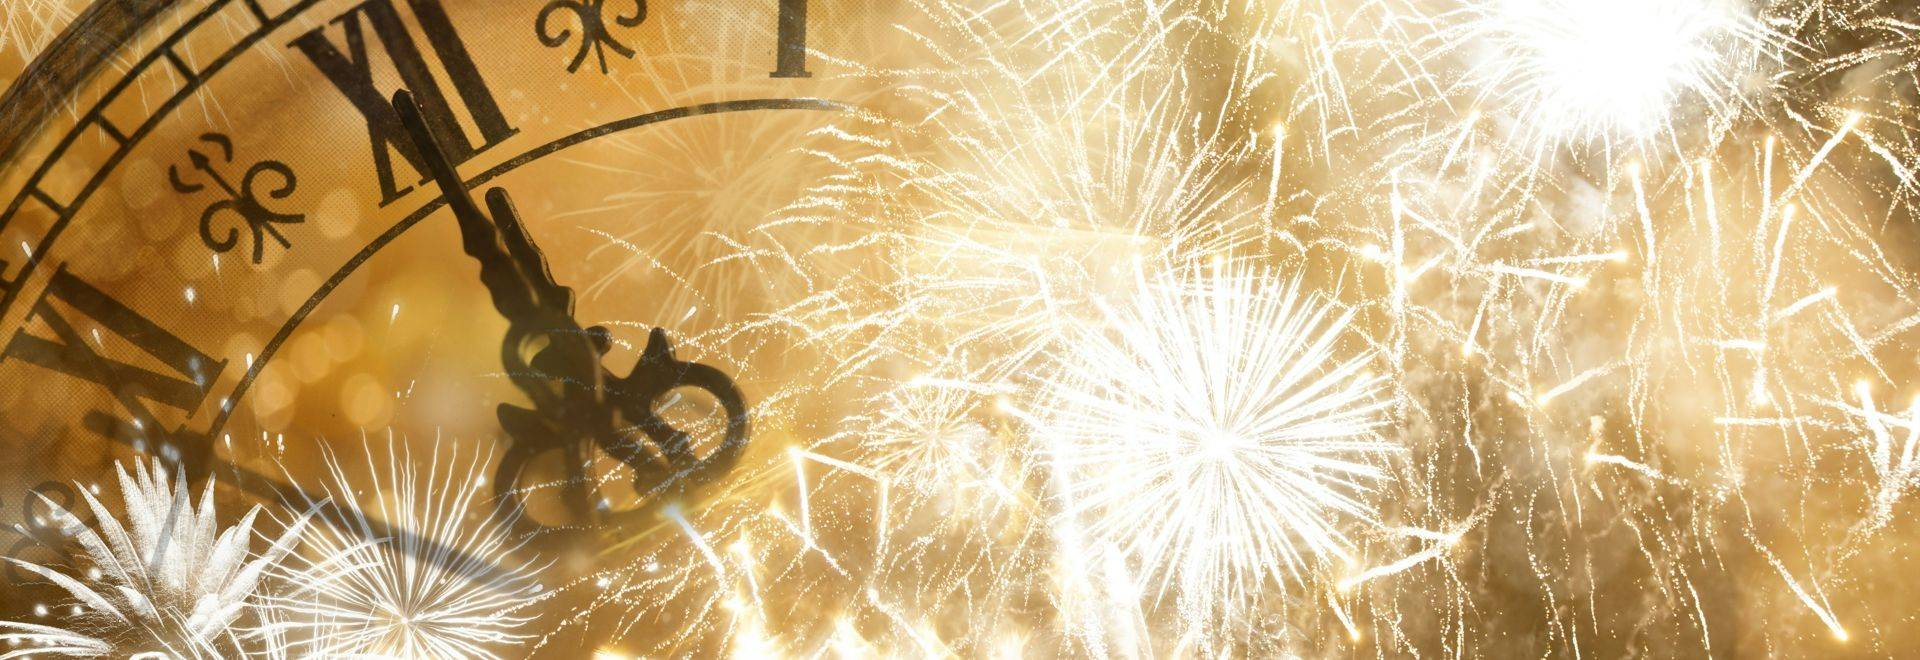 shutterstock_356254289 Countdown to the New Year.jpg